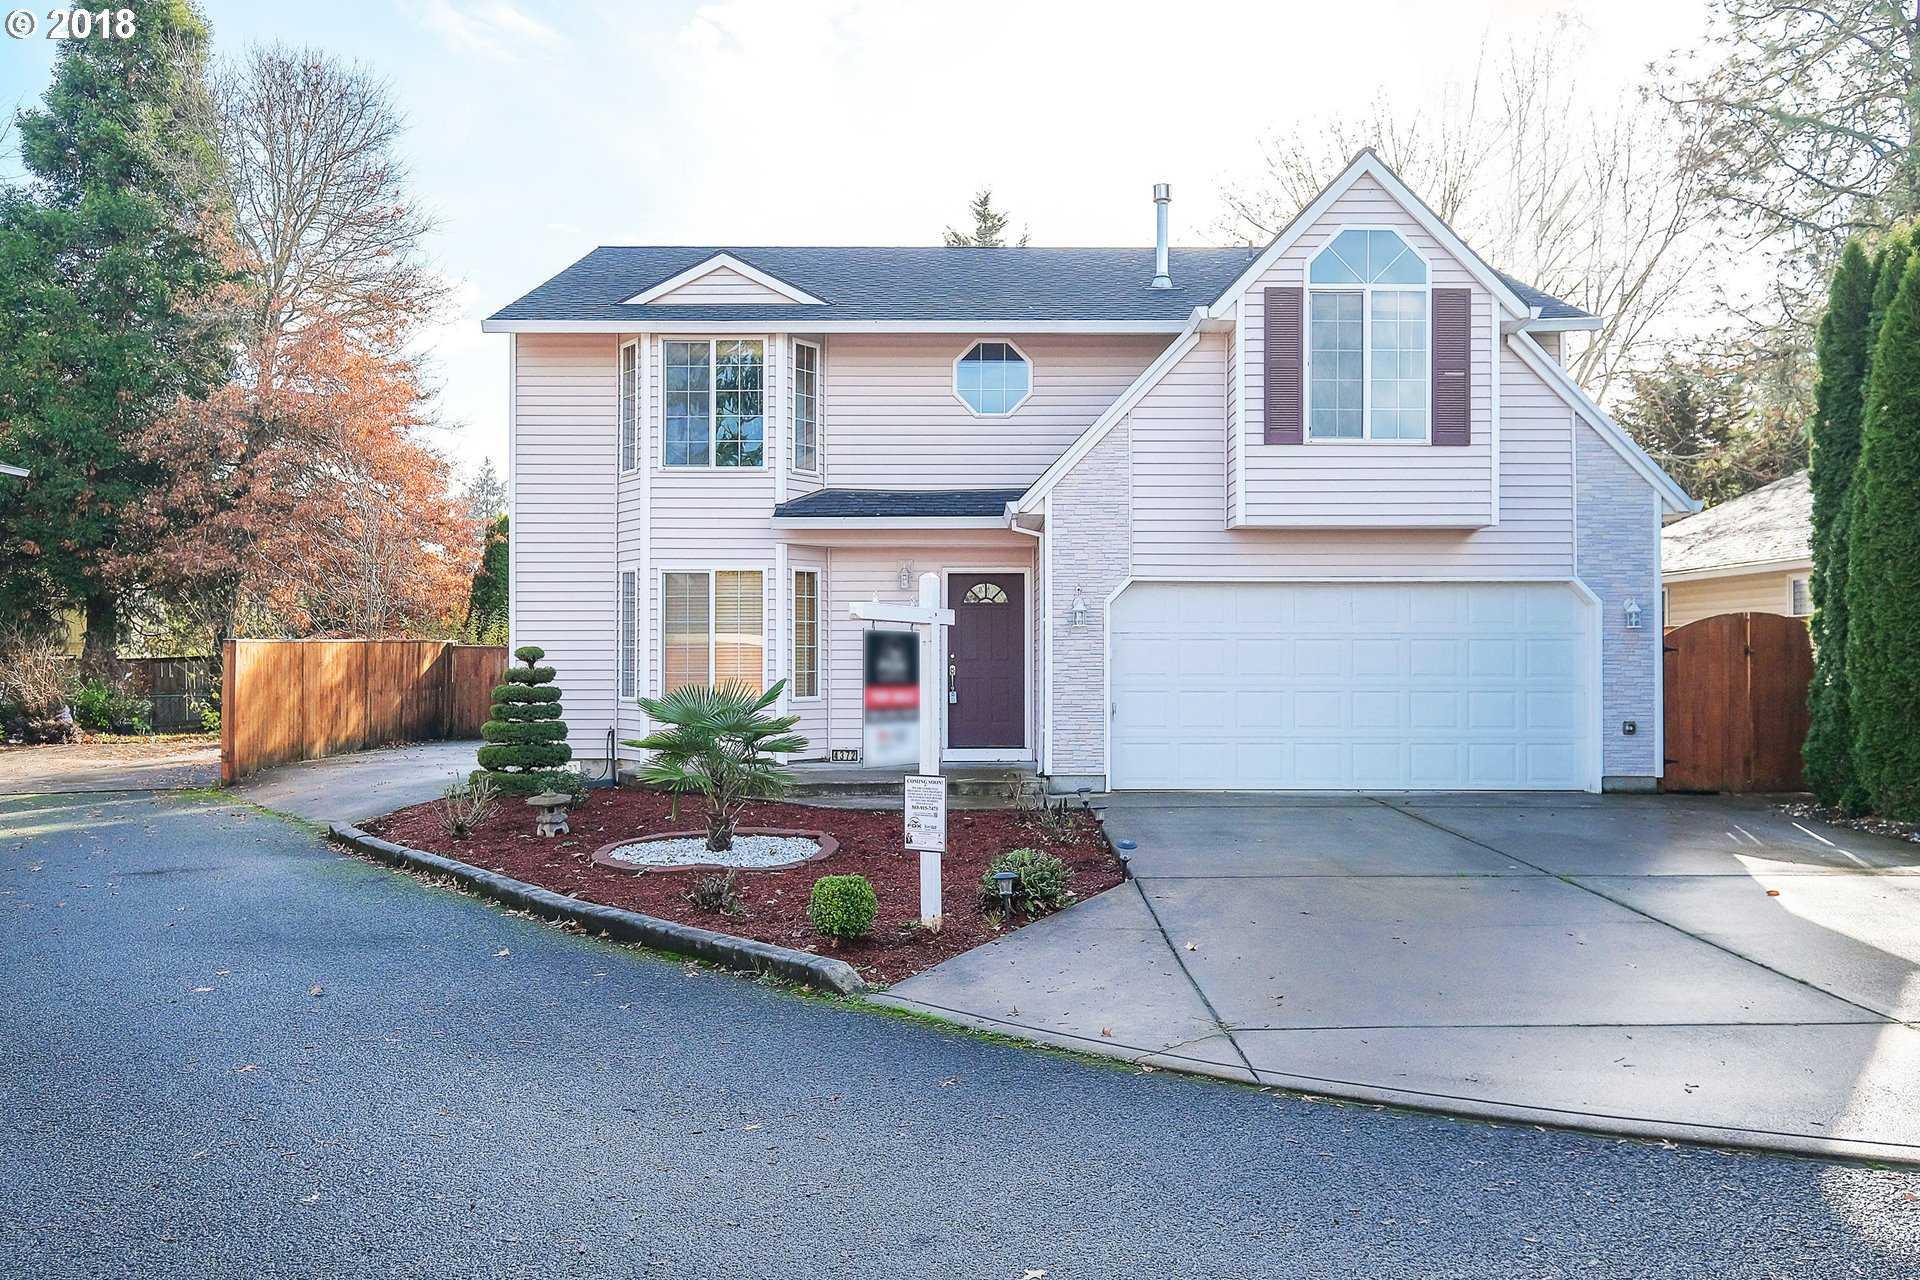 $450,000 - 4Br/3Ba -  for Sale in Hillsboro